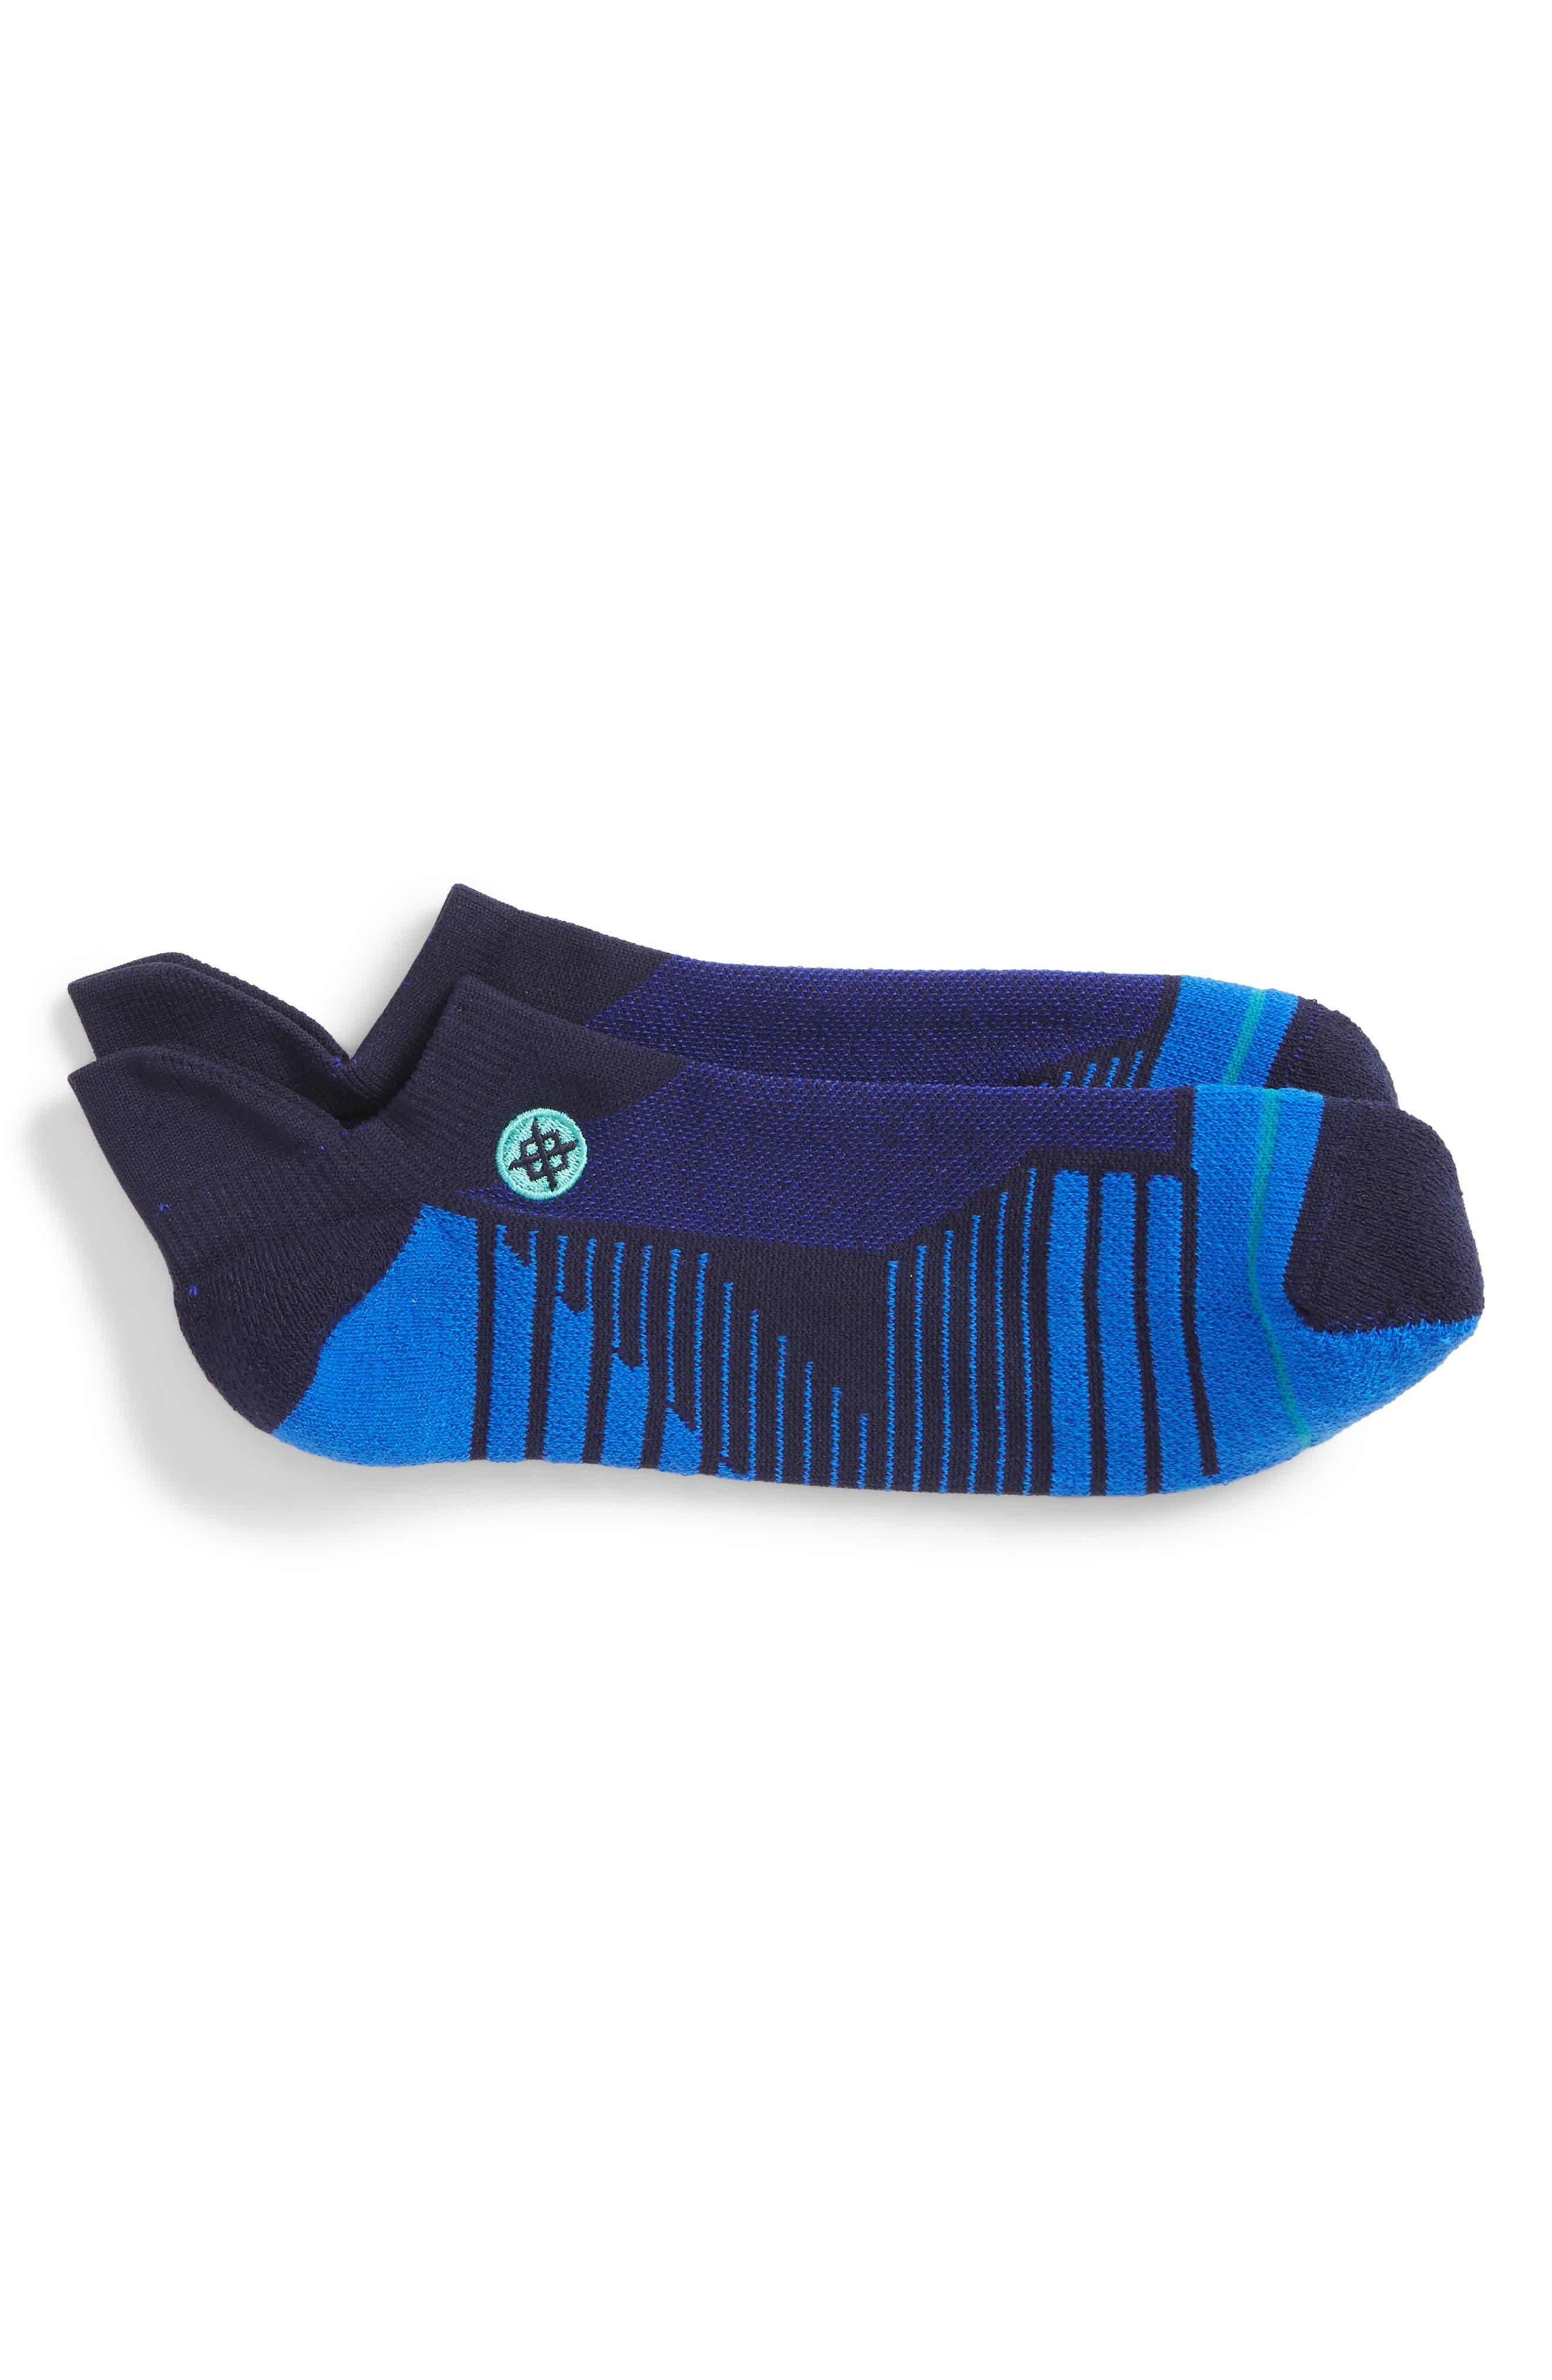 High Regard Tab Socks,                         Main,                         color,